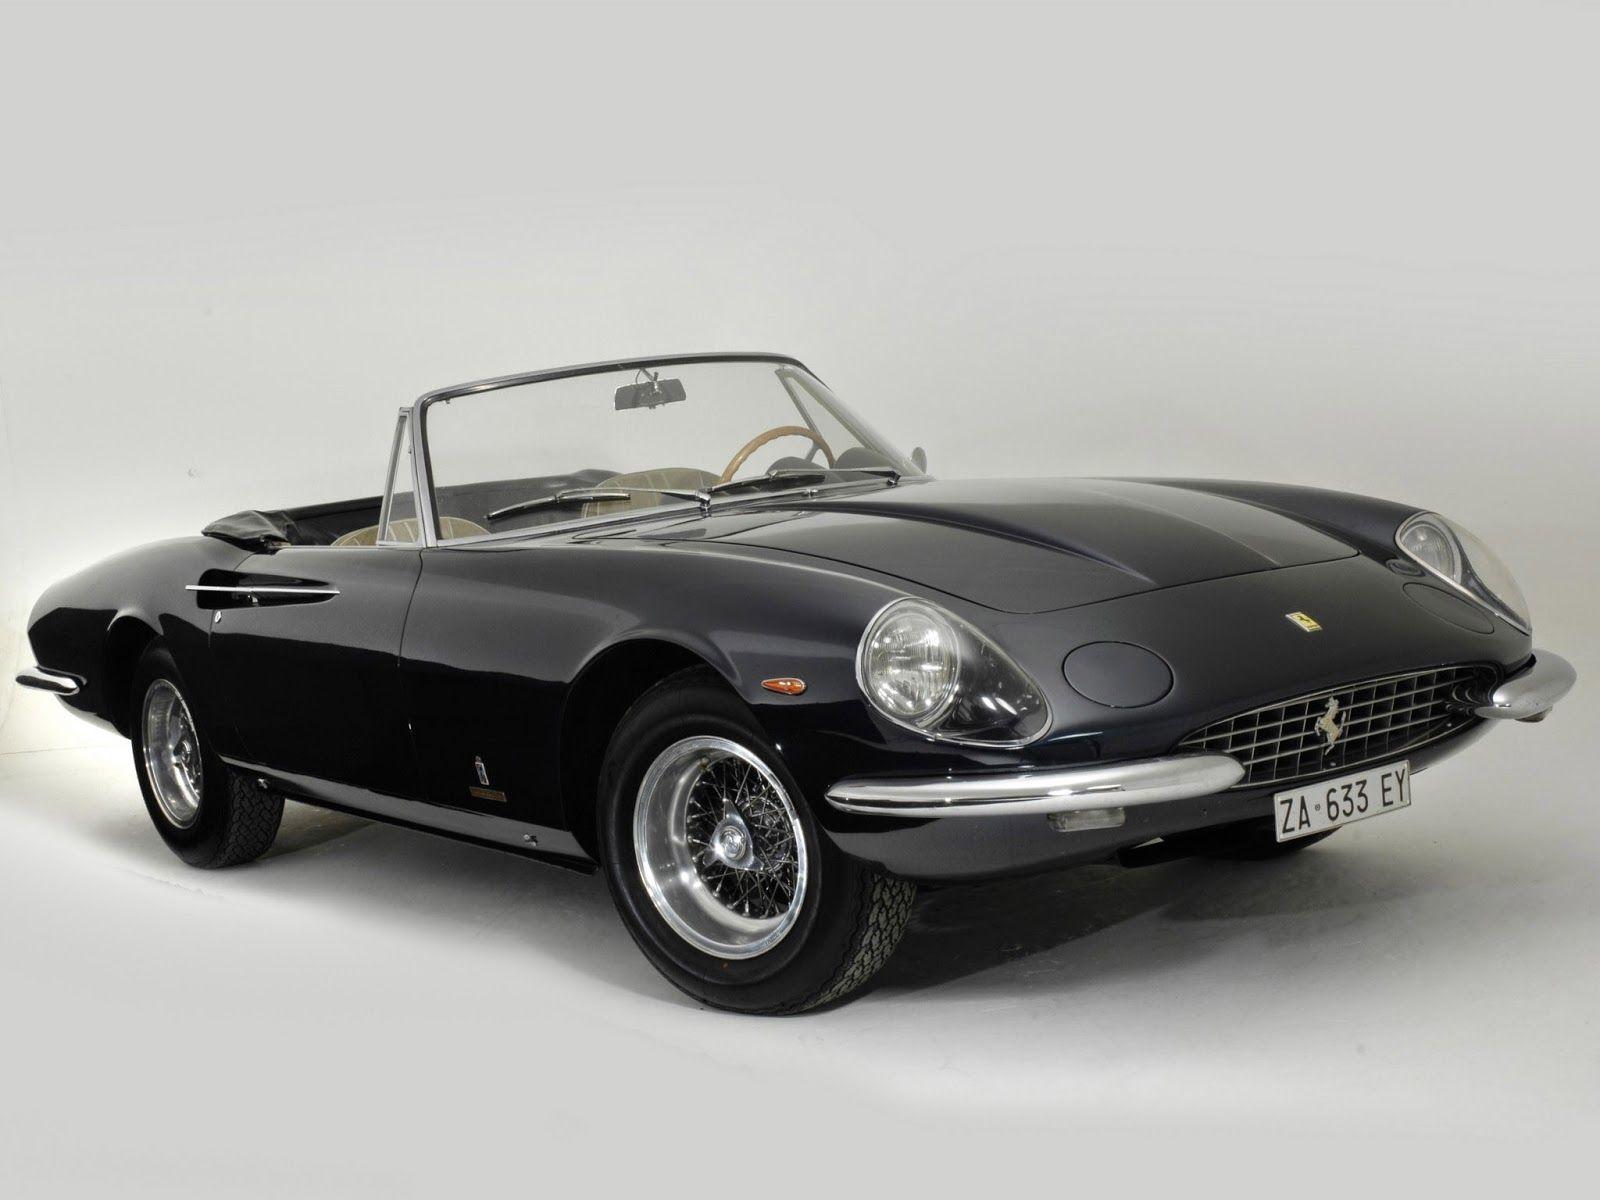 STORMWHEELS: Italia 1966 1967 - FERRARI 365 California Spider -...